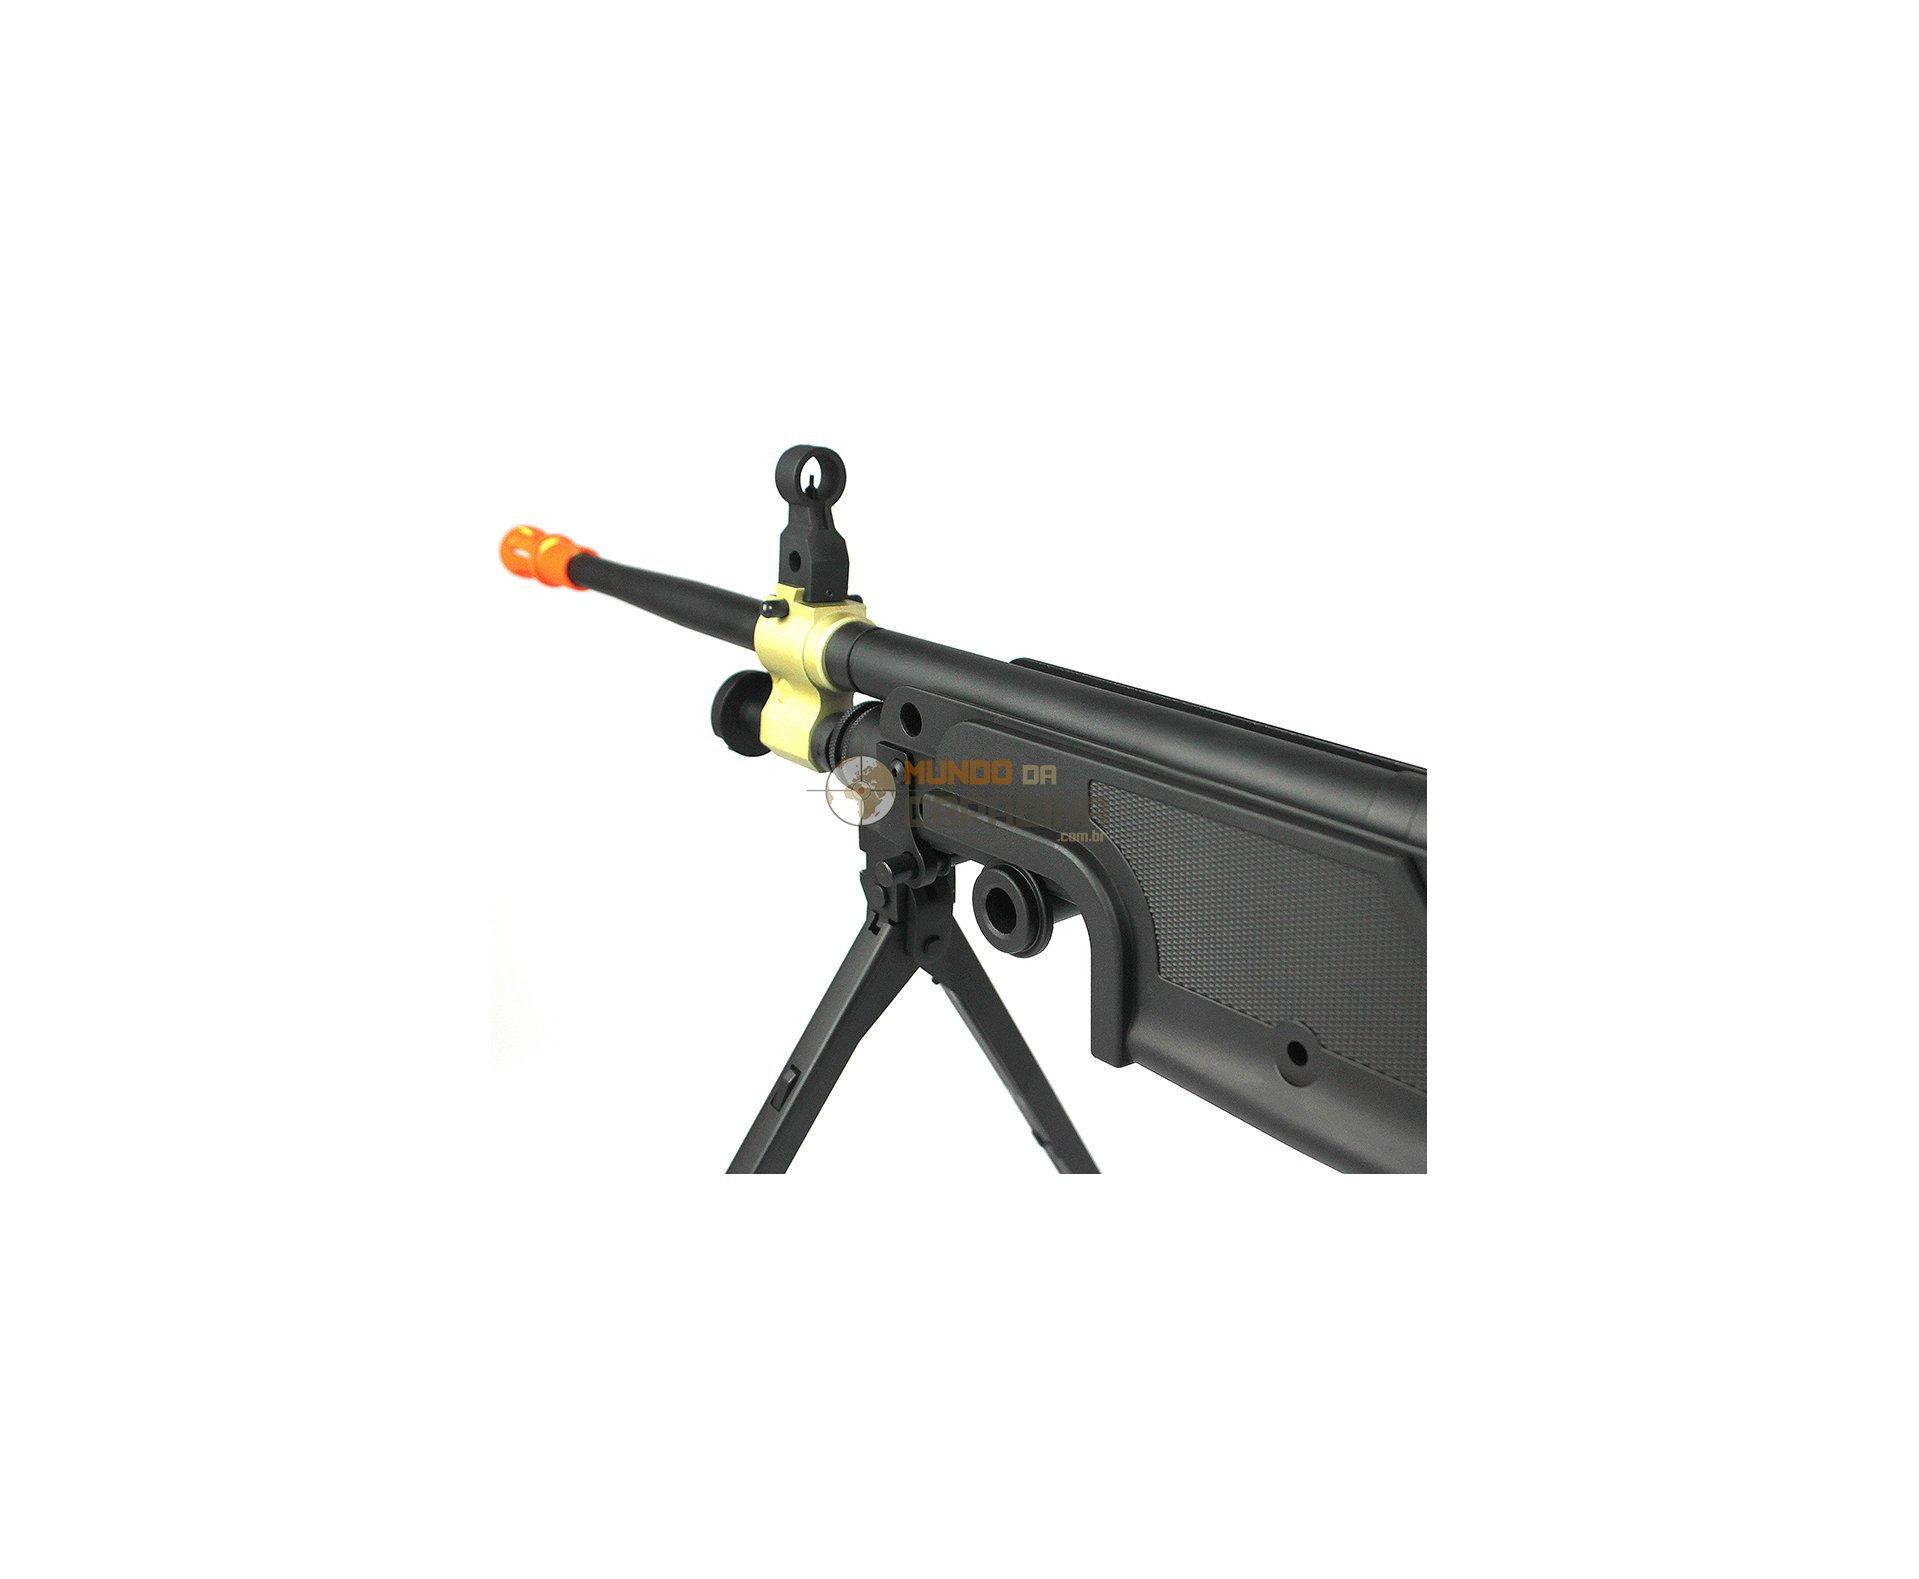 Rifle De Airsoft M249 Mk1 Full Metal Elétrica 6mm - A&k